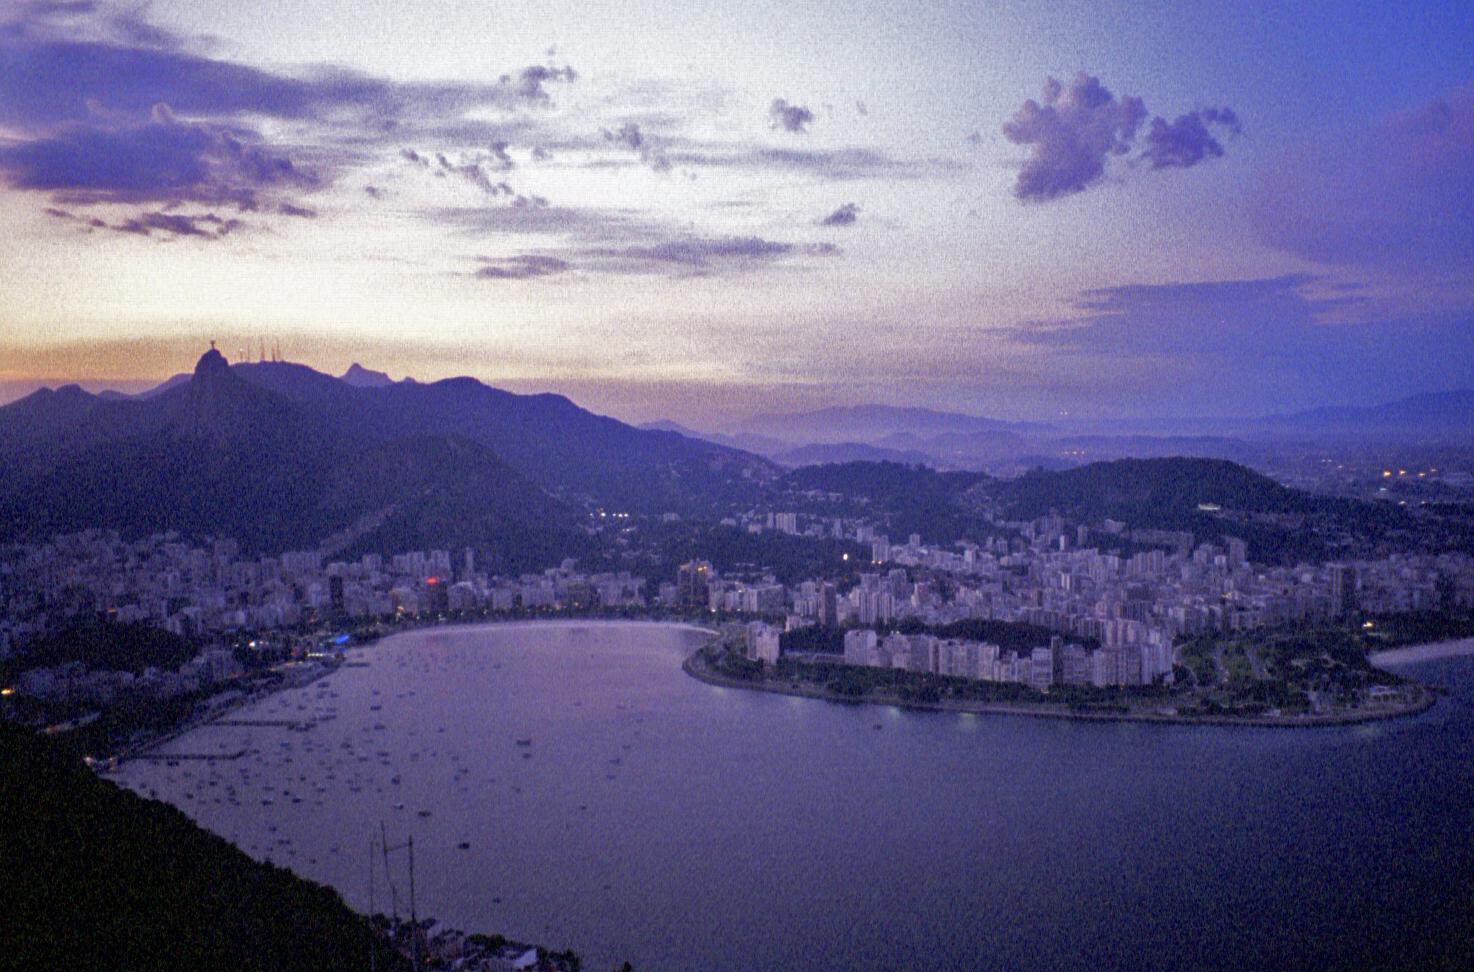 view from Pão de Açúcar (note: this image is not suitable for large prints)